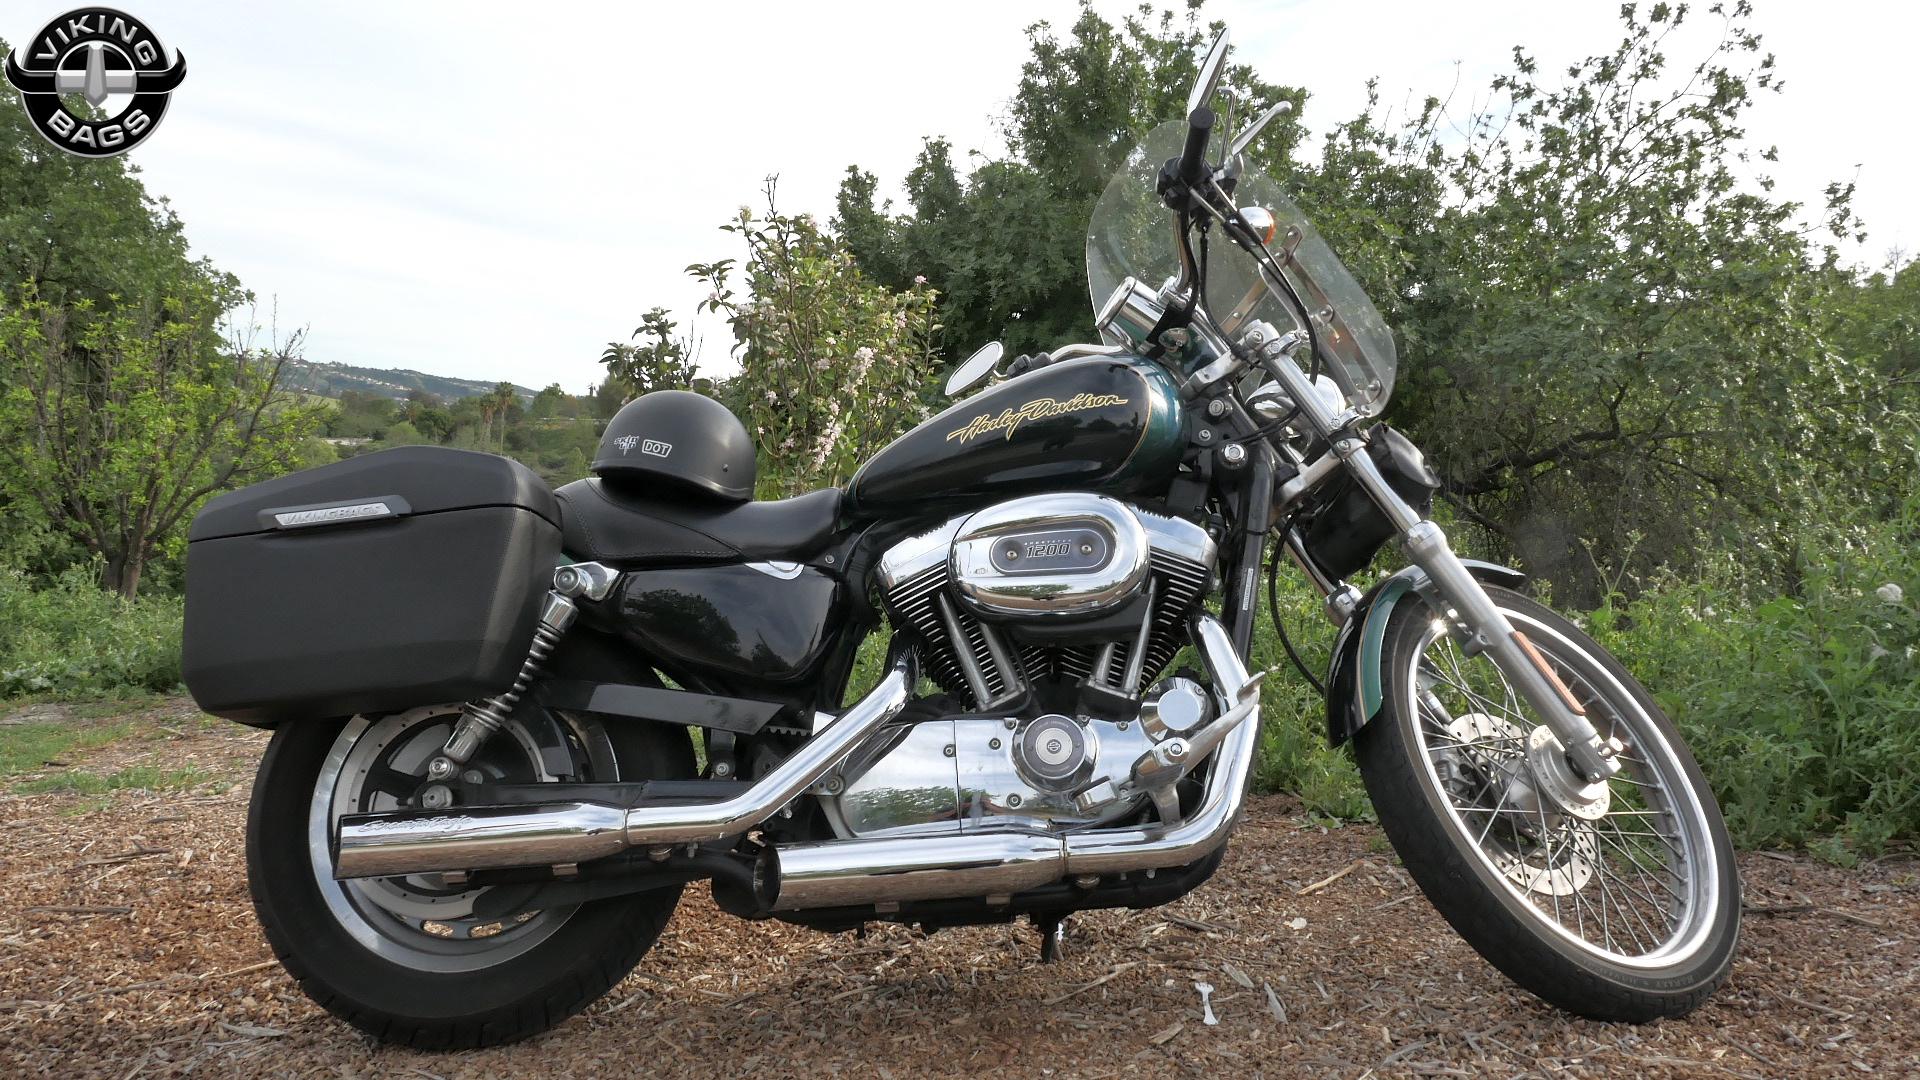 Harley softail slim saddlebags l viking lamellar leather for Motor cycle saddle bags